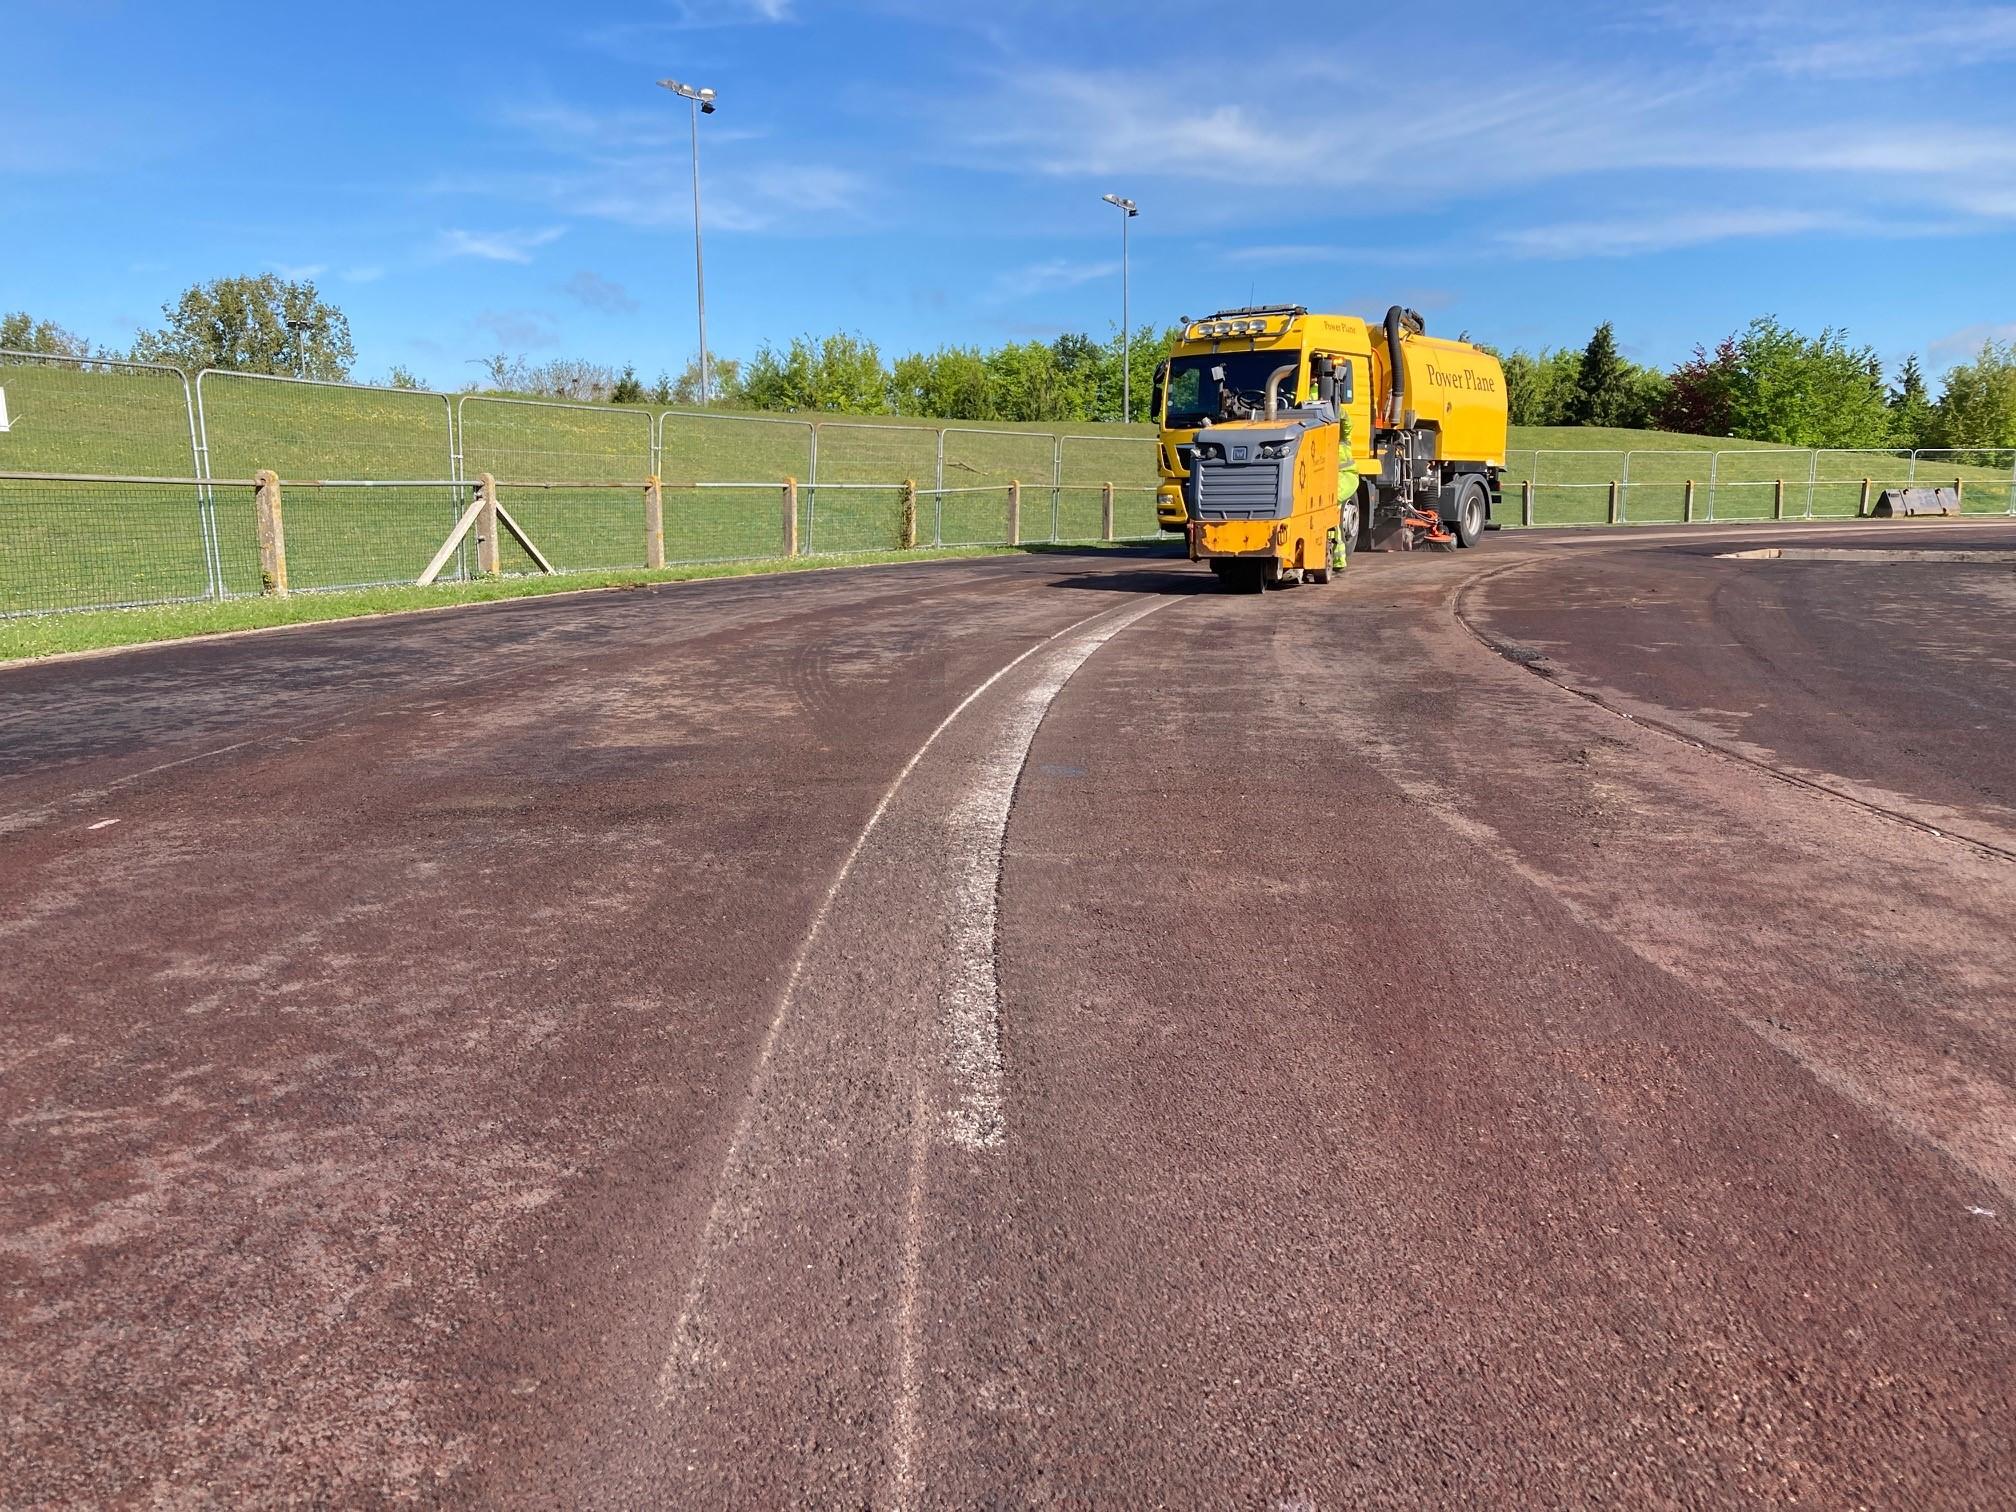 Athletics track resurface